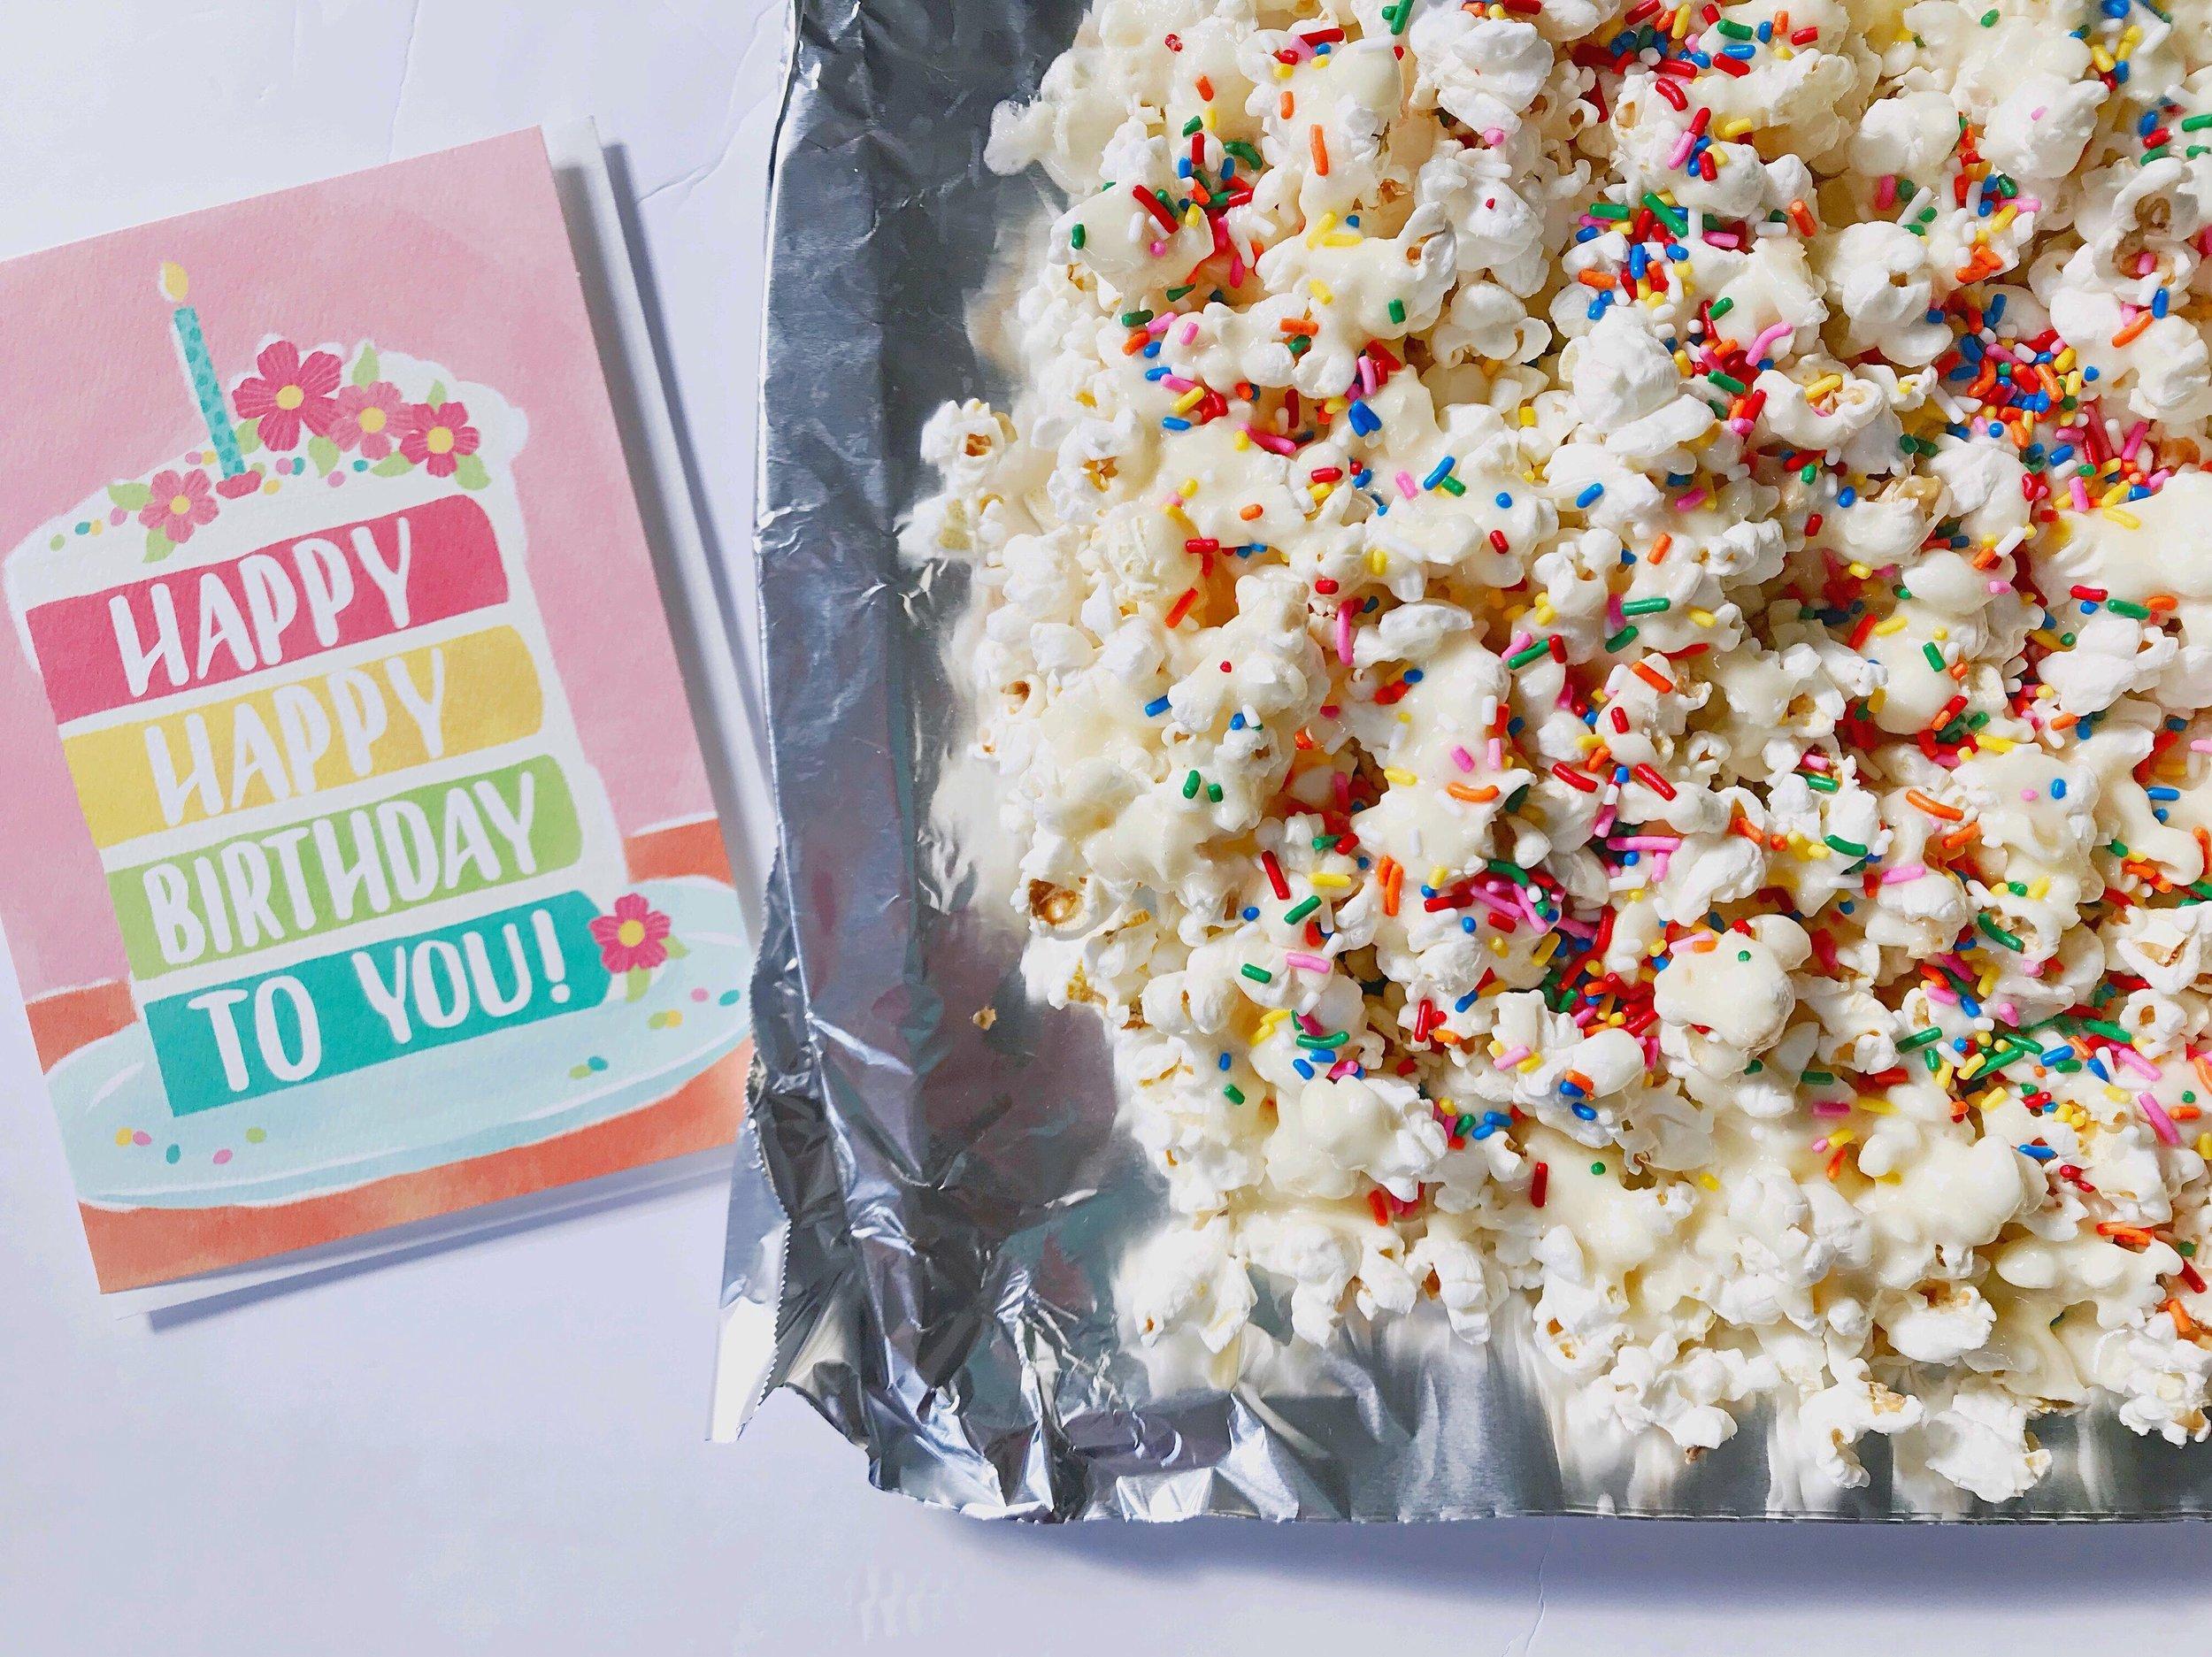 Astounding An Alternative To Birthday Cake Staci Wearing Stripes Funny Birthday Cards Online Barepcheapnameinfo